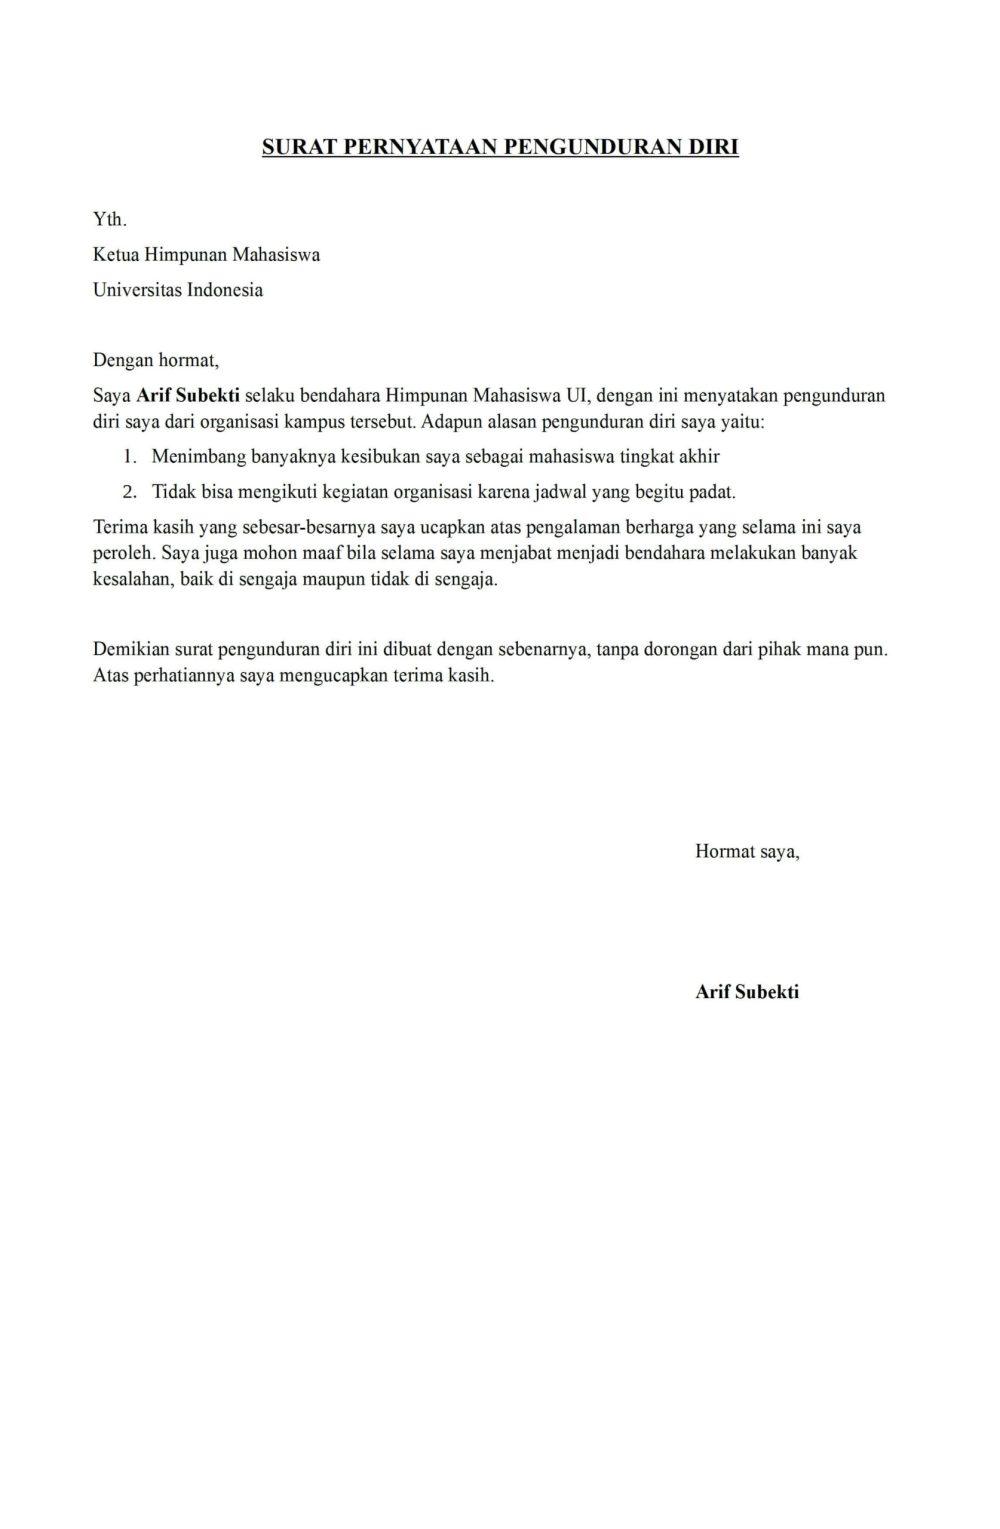 5. Contoh Surat Pernyataan Pengunduran Diri Calon Mahasiswa